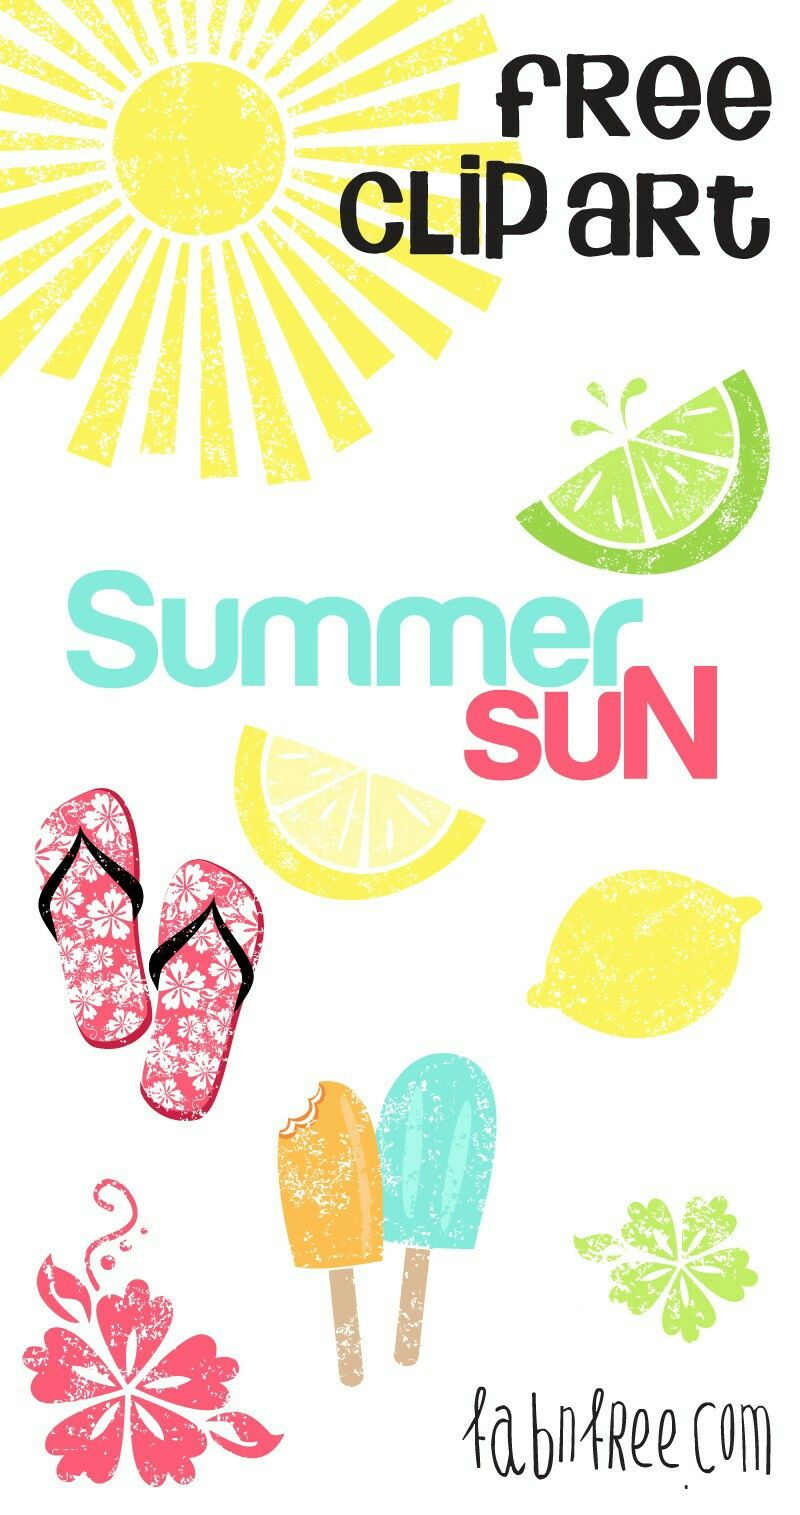 Pinleslie Cortinas On Jjc Birthday Parties   Pinterest   Sun - Free Printable Summer Clip Art